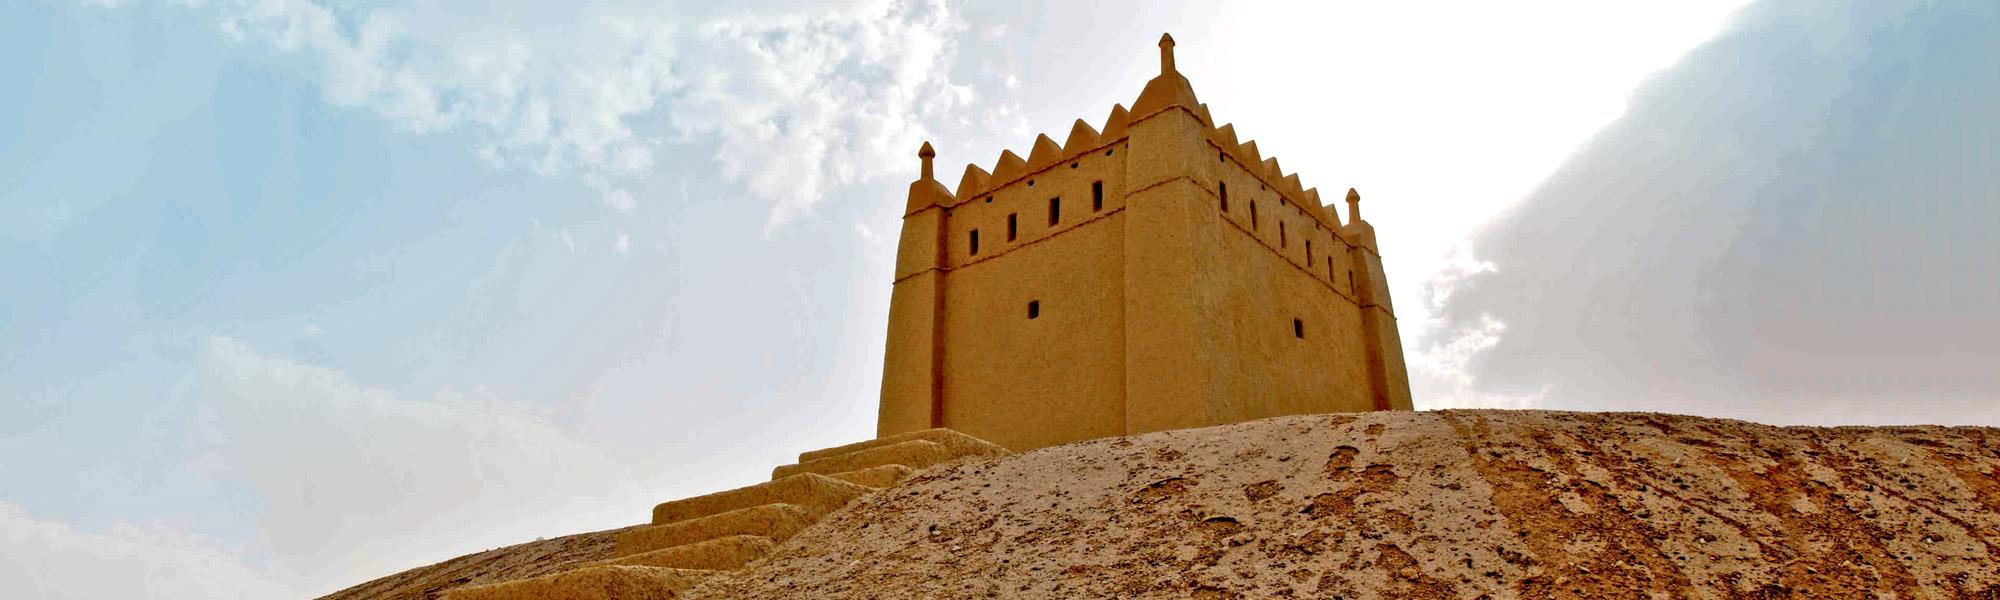 Hili Archaeological Site Abu Dhabi Culture